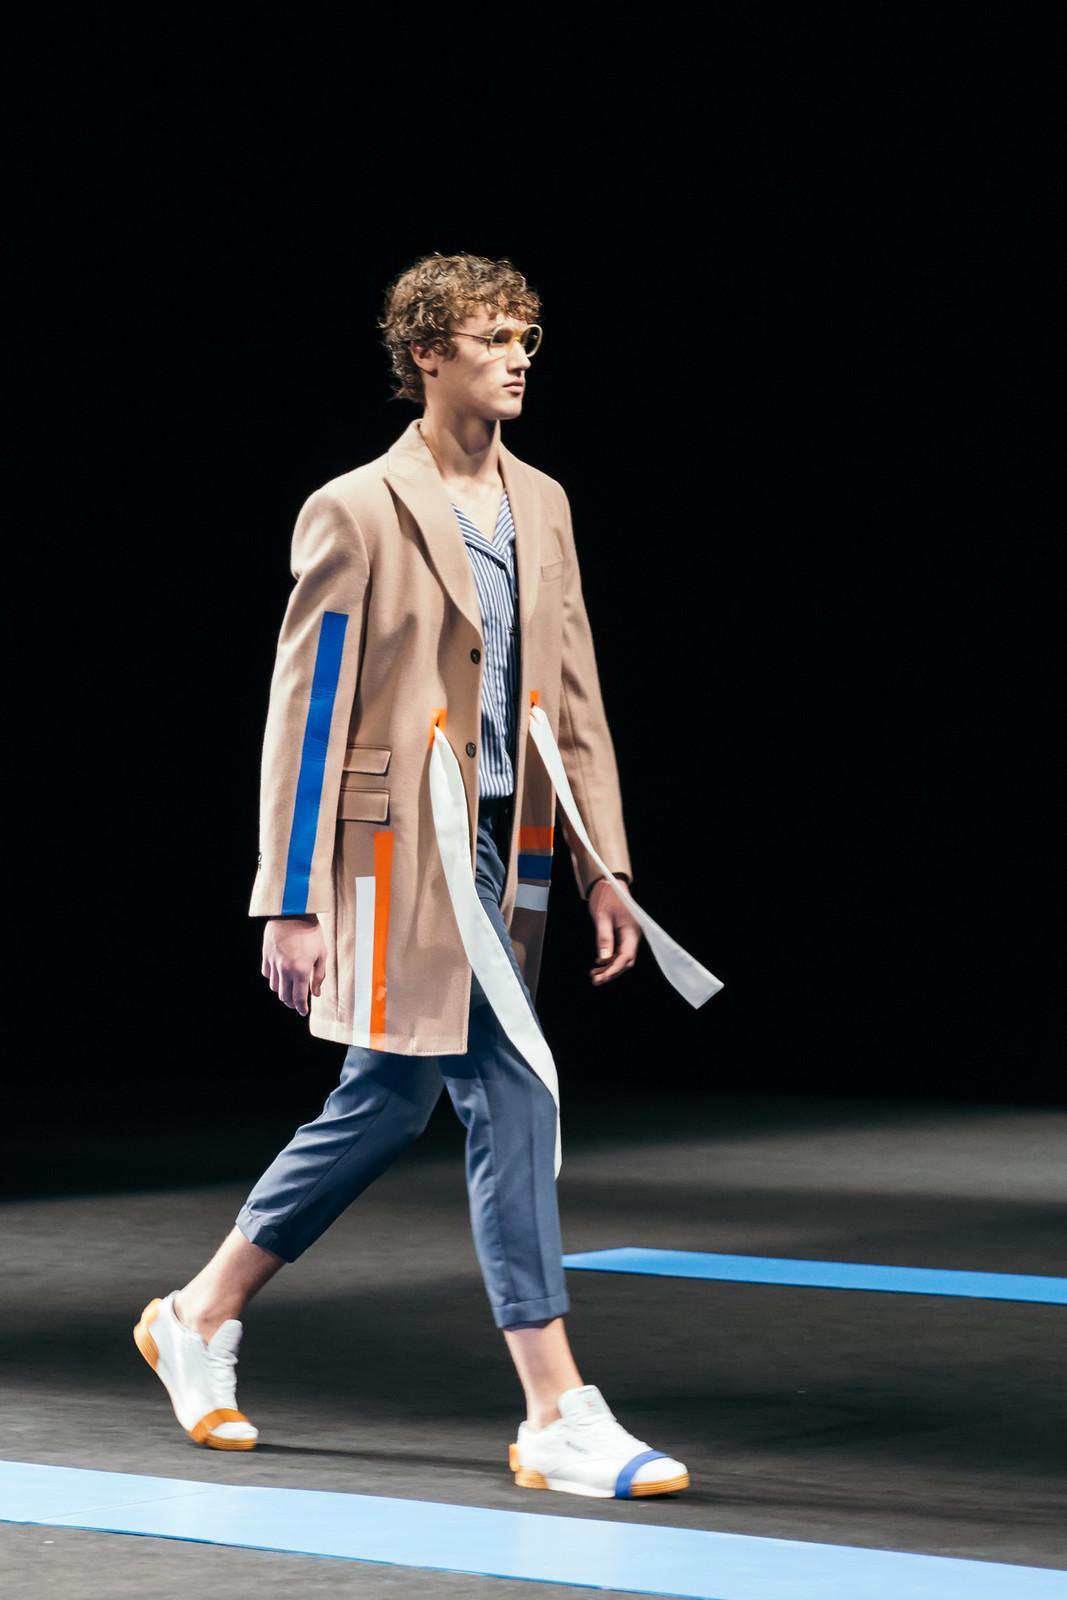 Jessie Chanes - Seams for a desire - 080 Bacelona Fashion #080bcnfasion -45